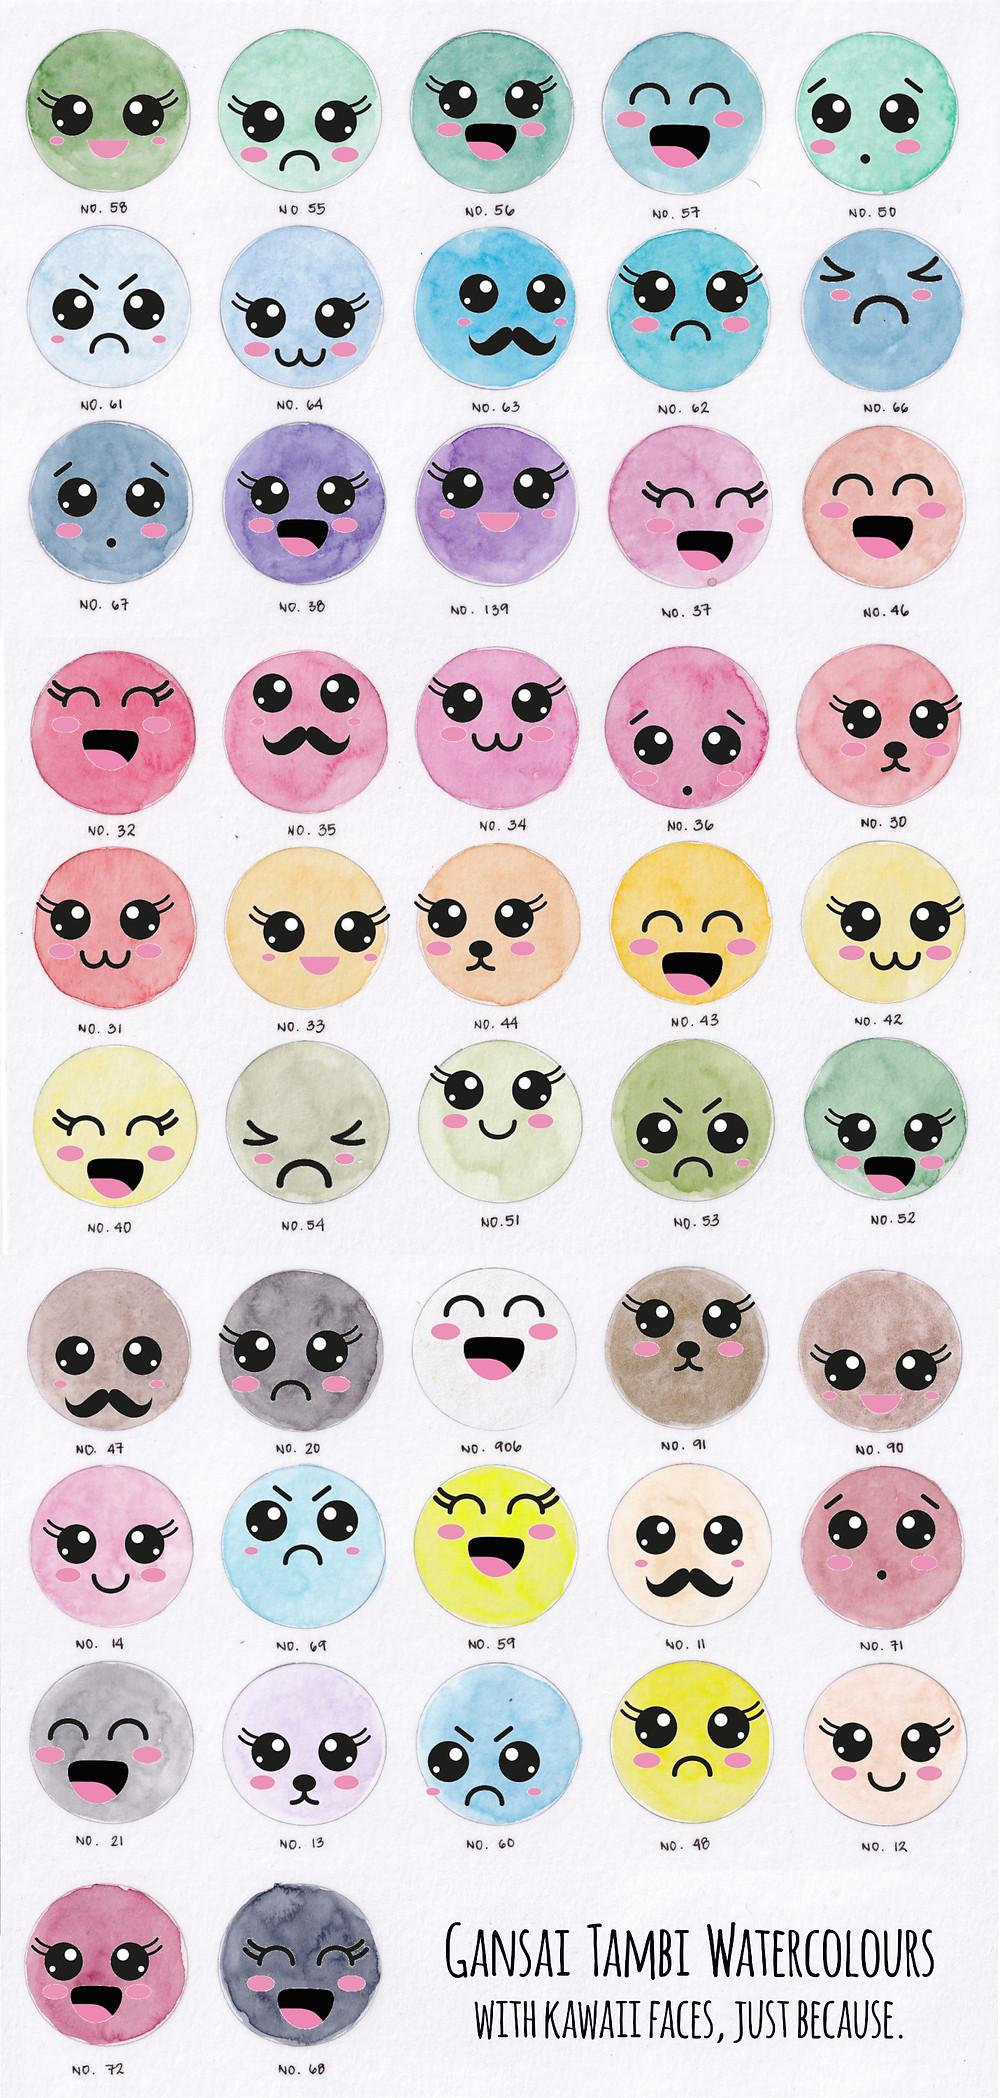 48 Set Gansai Tambi Watercolours Light wash swatch kawaii cute faces